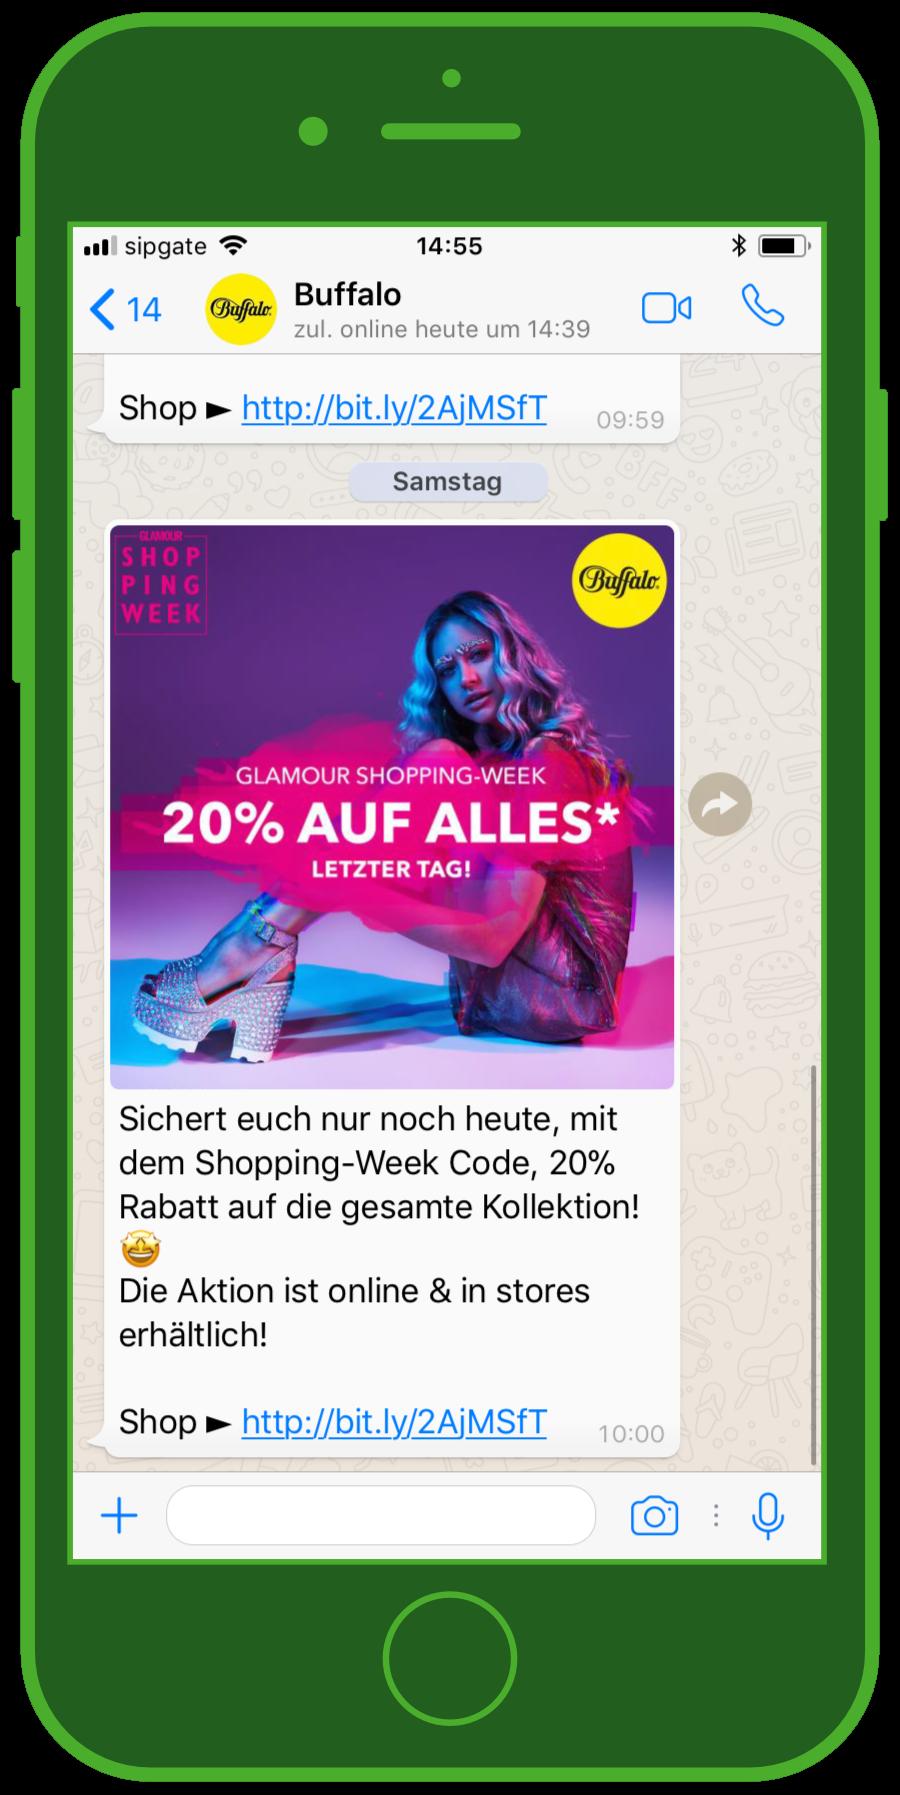 device-fashion-screenshot-whatsapp-buffalo